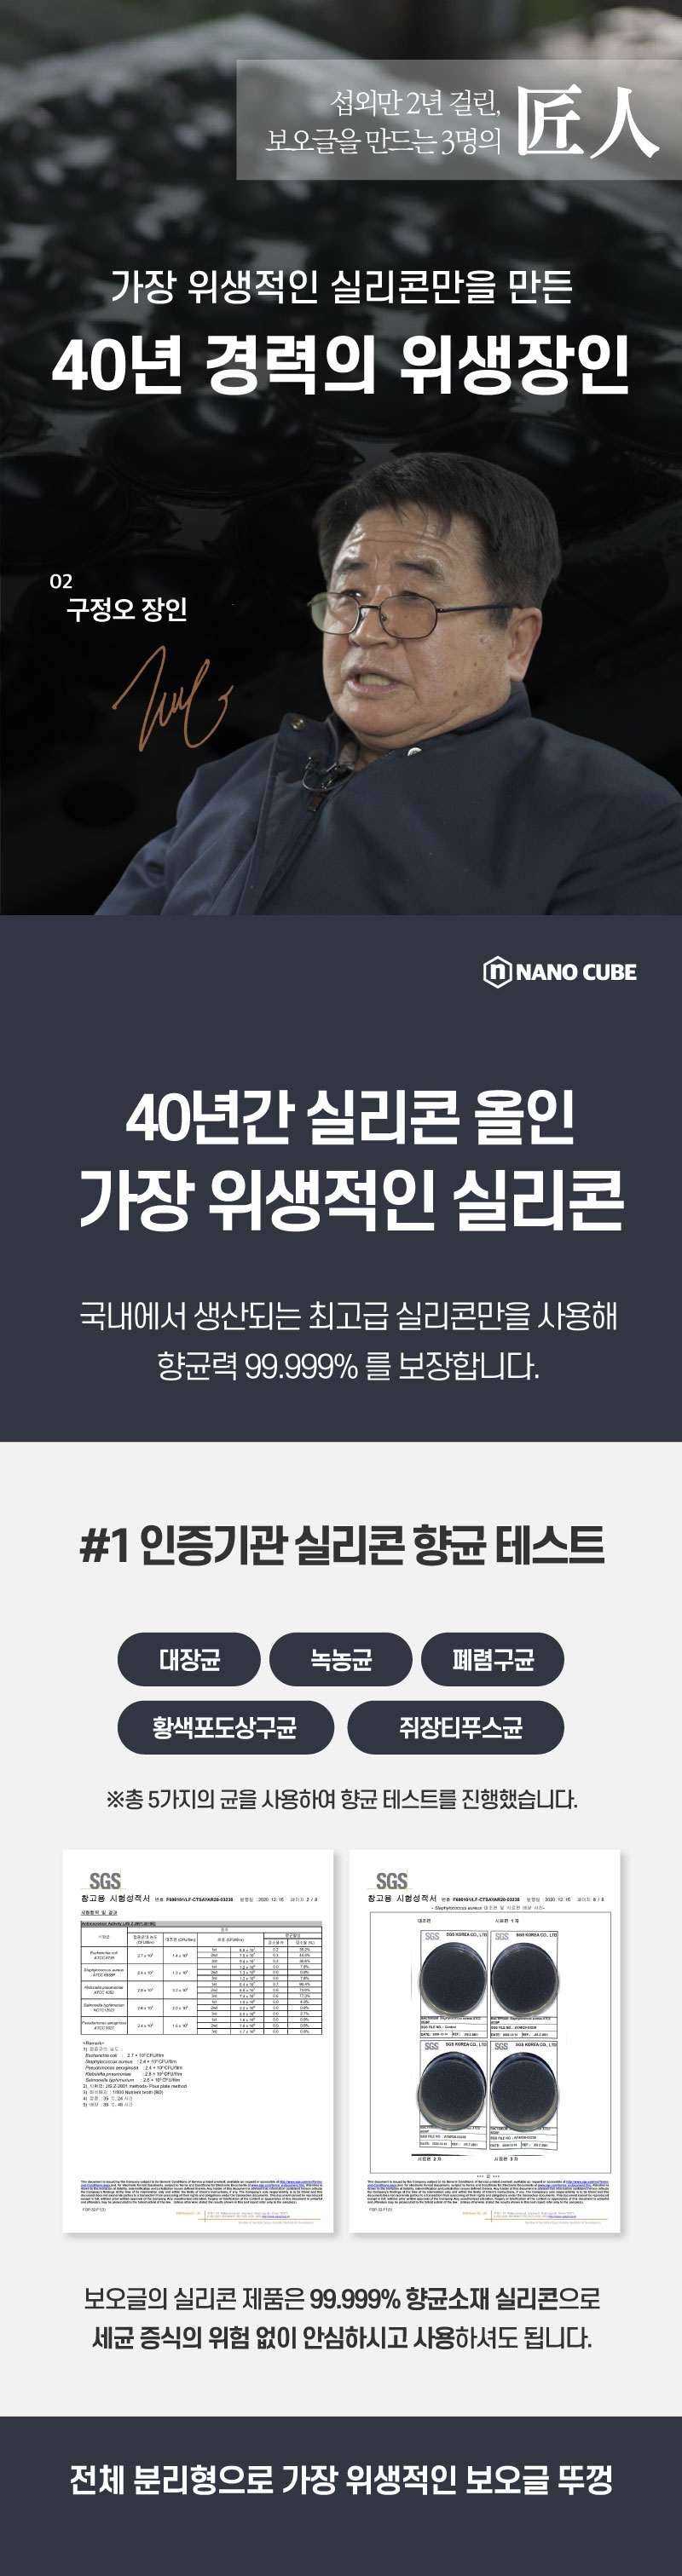 nemo_56.jpg